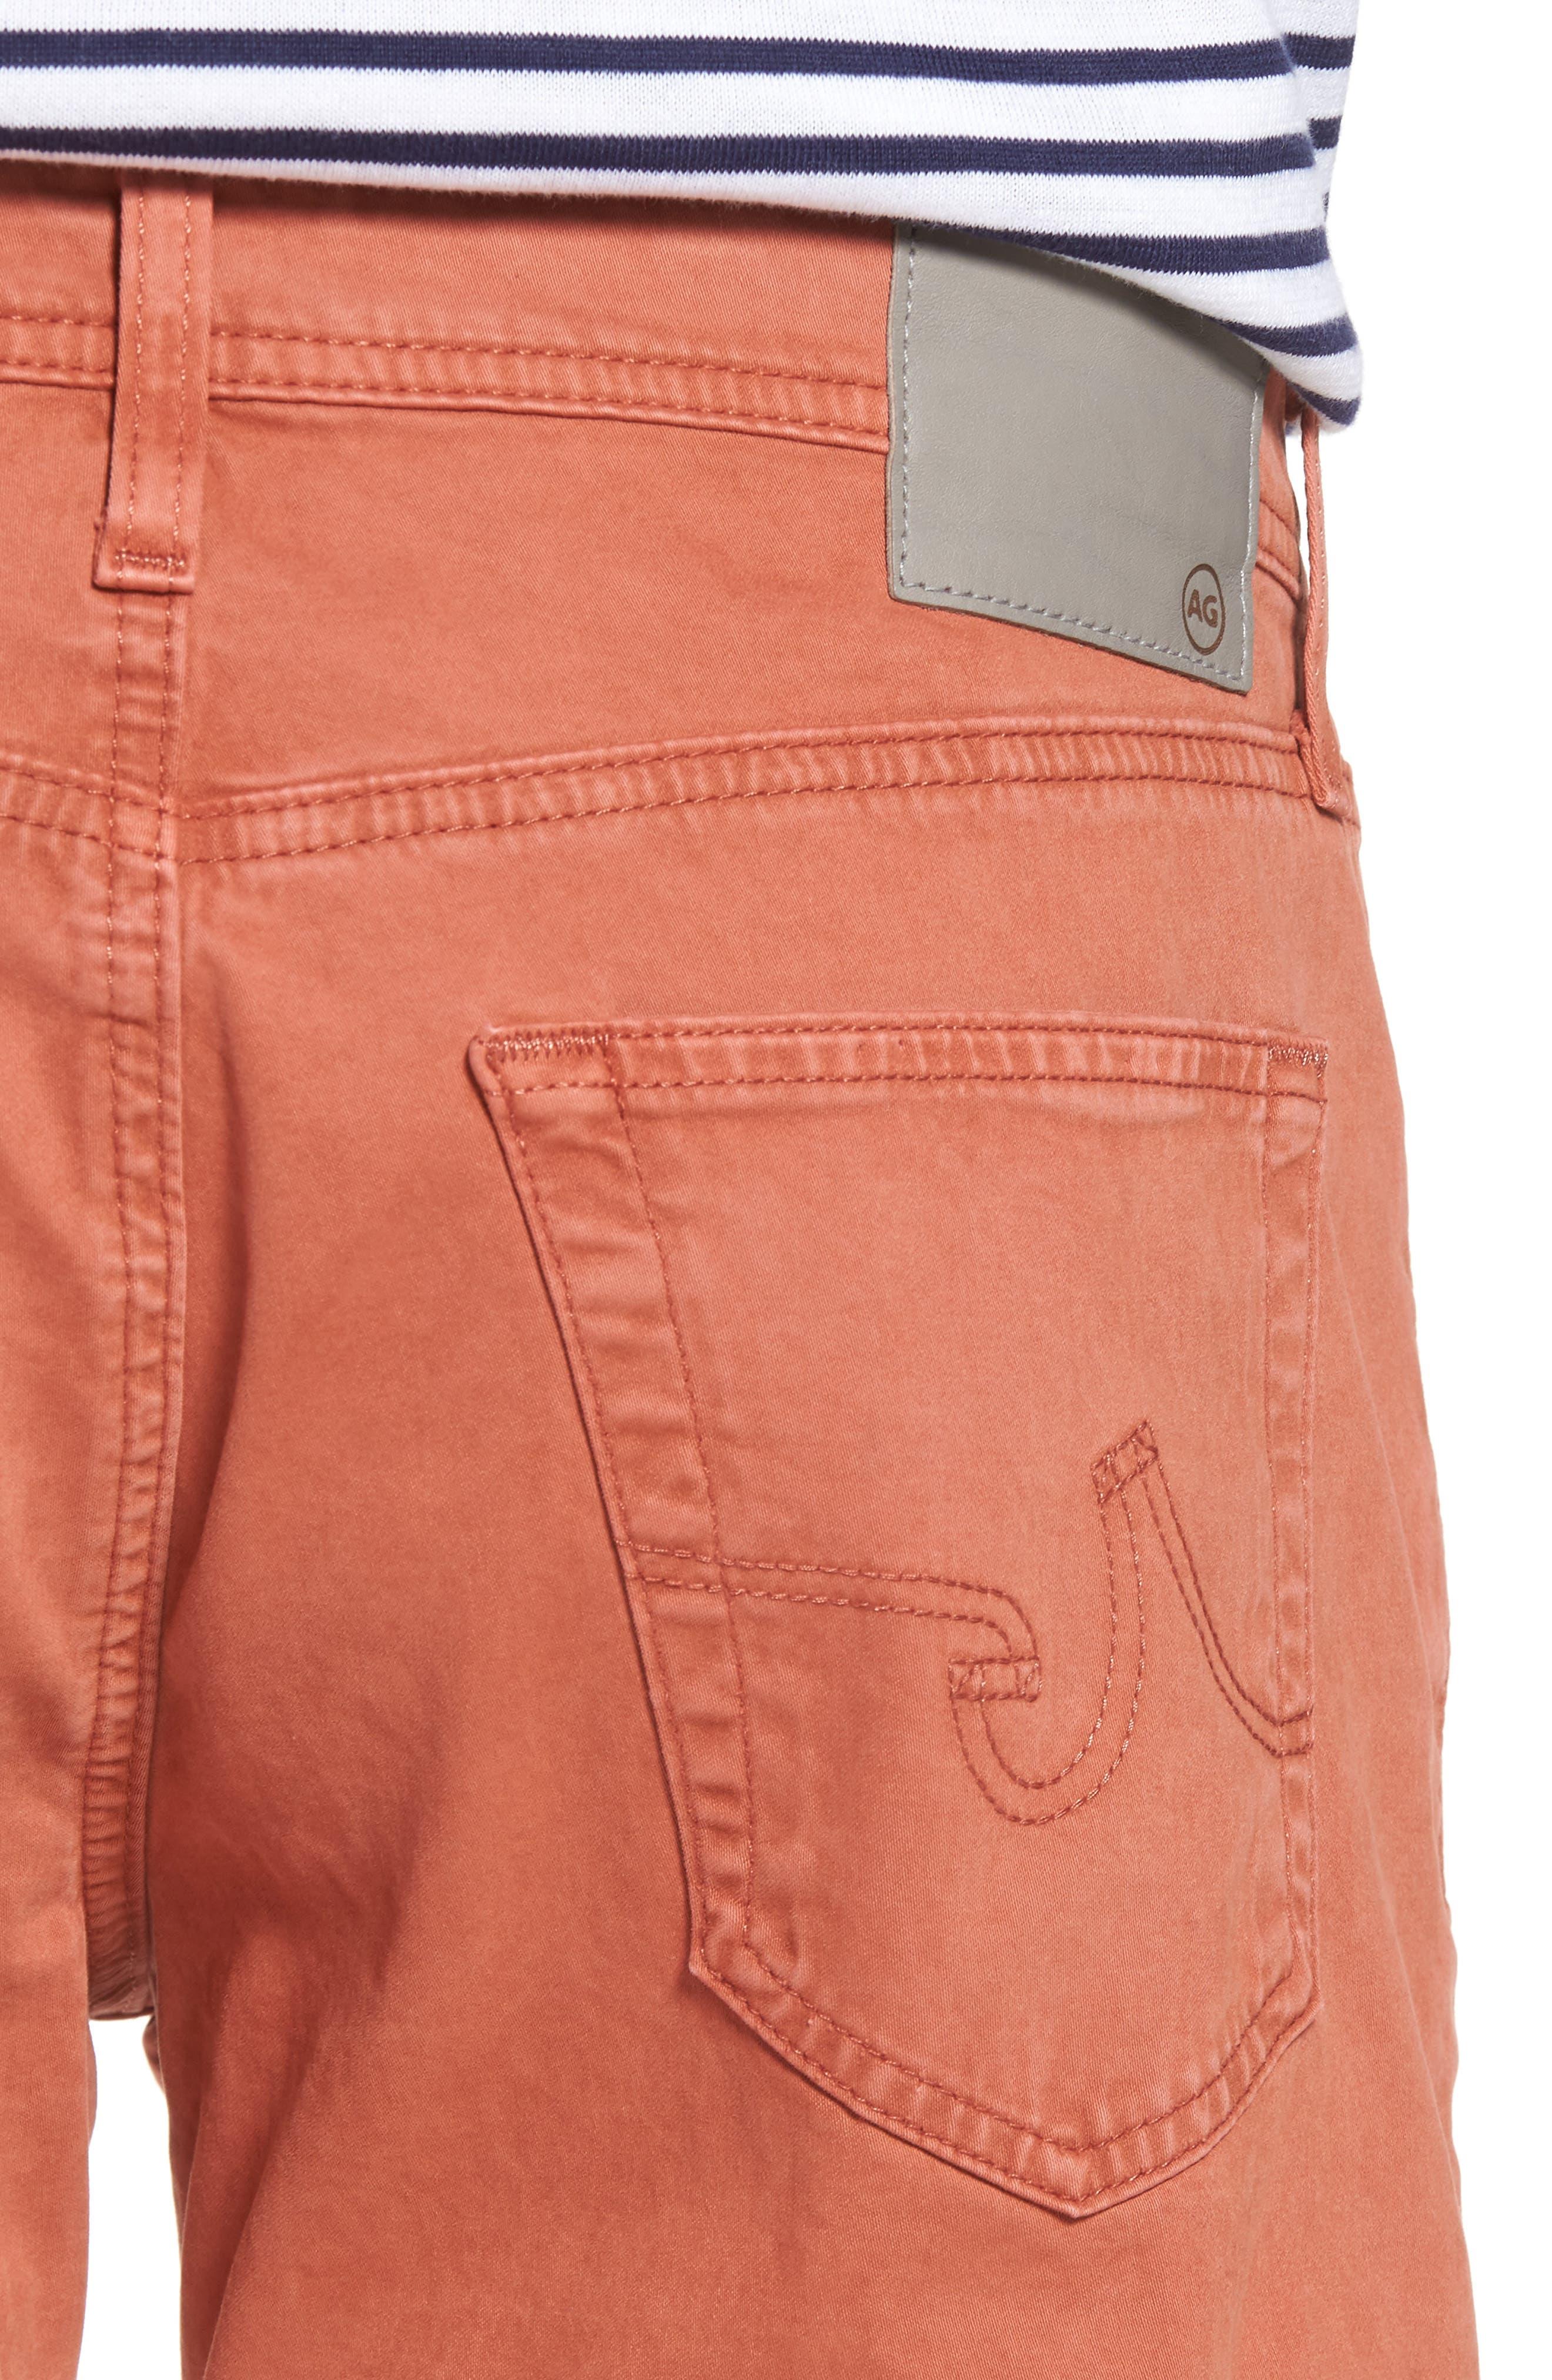 Graduate SUD Slim Straight Leg Pants,                             Alternate thumbnail 4, color,                             Sulfur Rosso Red